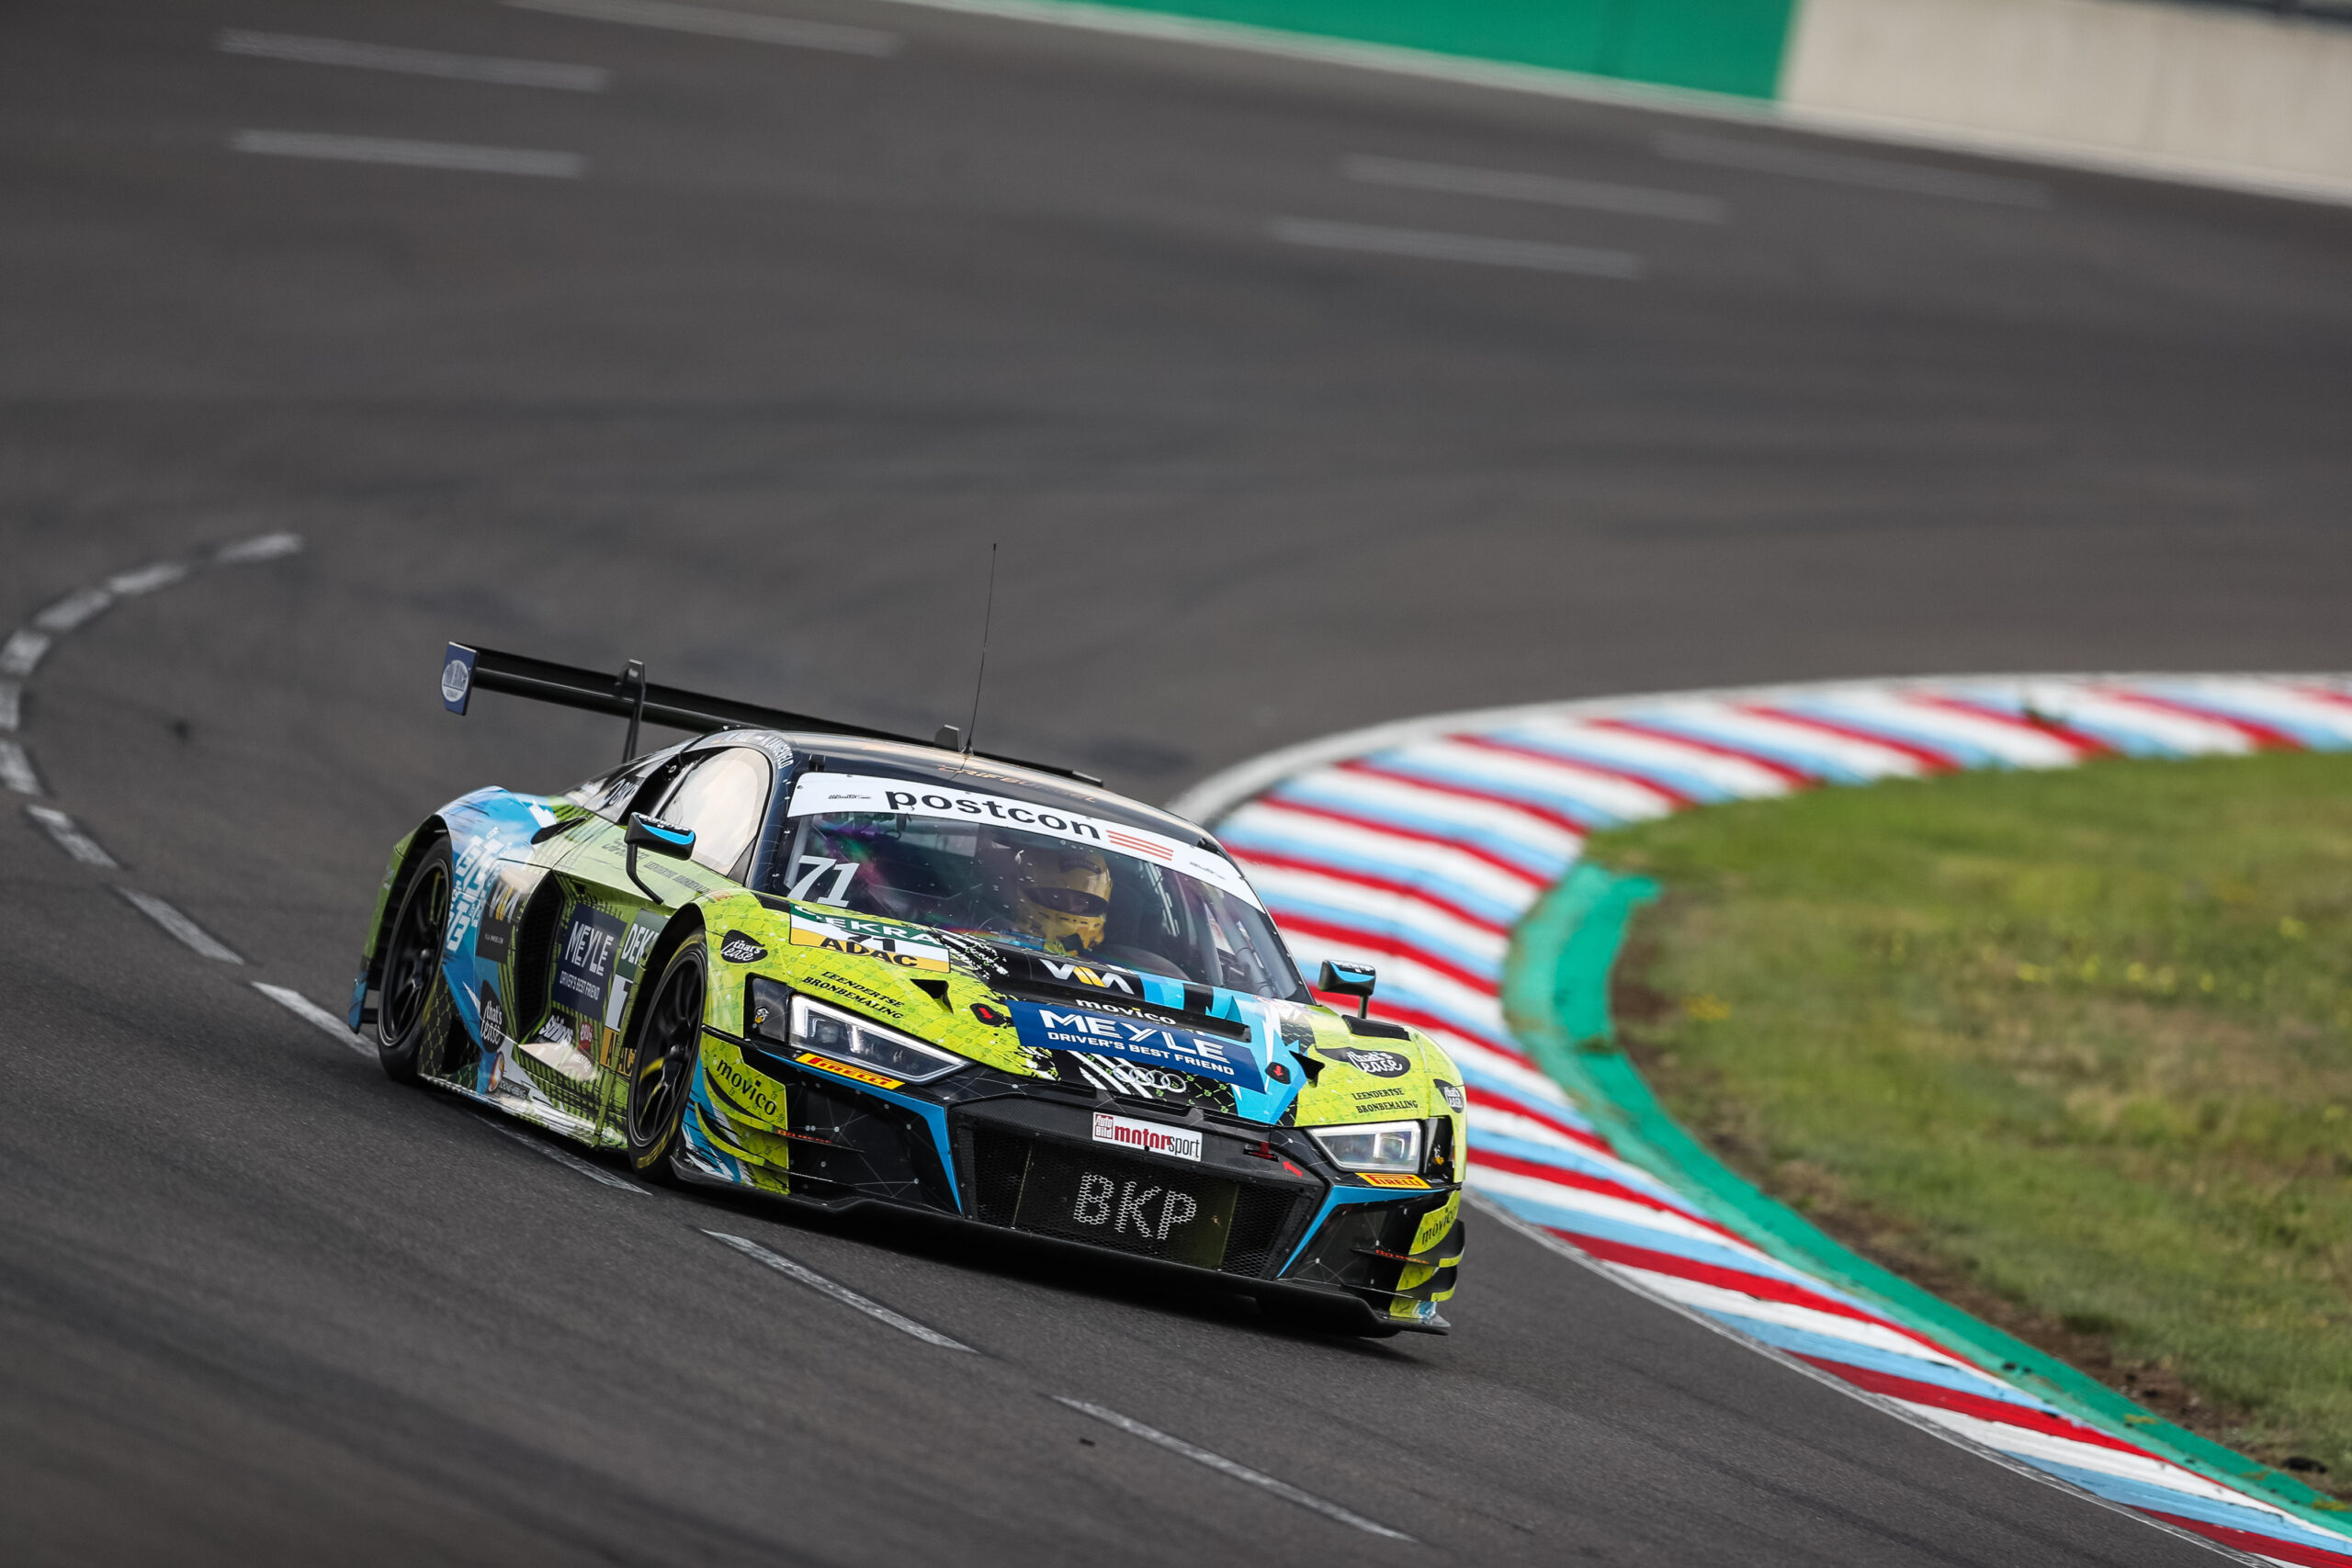 ADAC GT Masters, Testfahrten Lausitzring 2020 - Foto: Gruppe C Photography